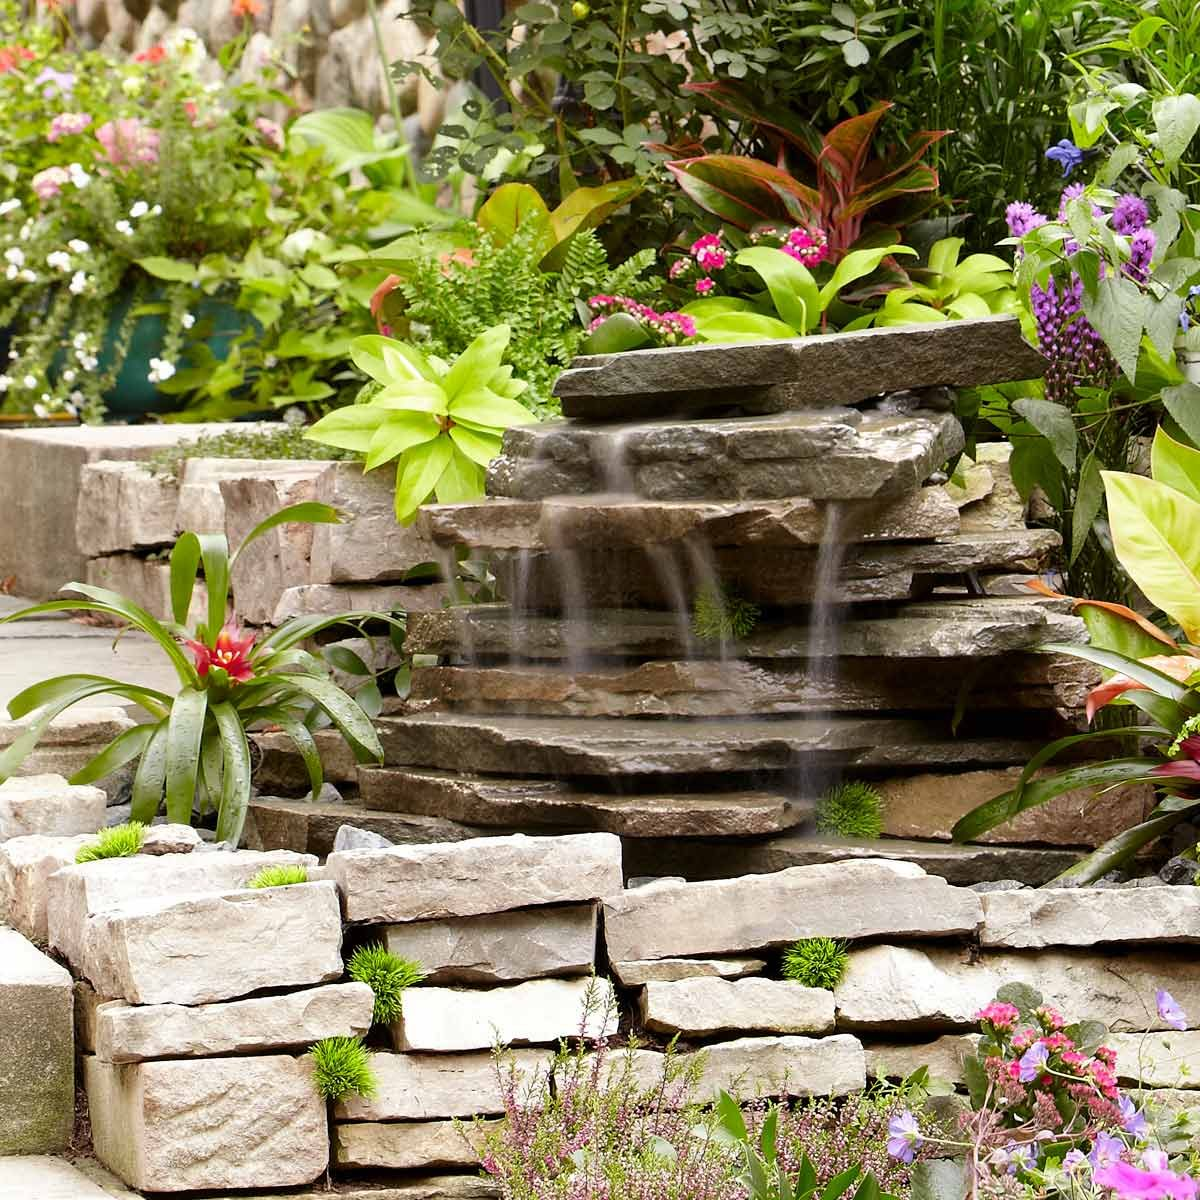 Backyard Waterfall | Family Handyman on Rock Garden Waterfall Ideas  id=21309